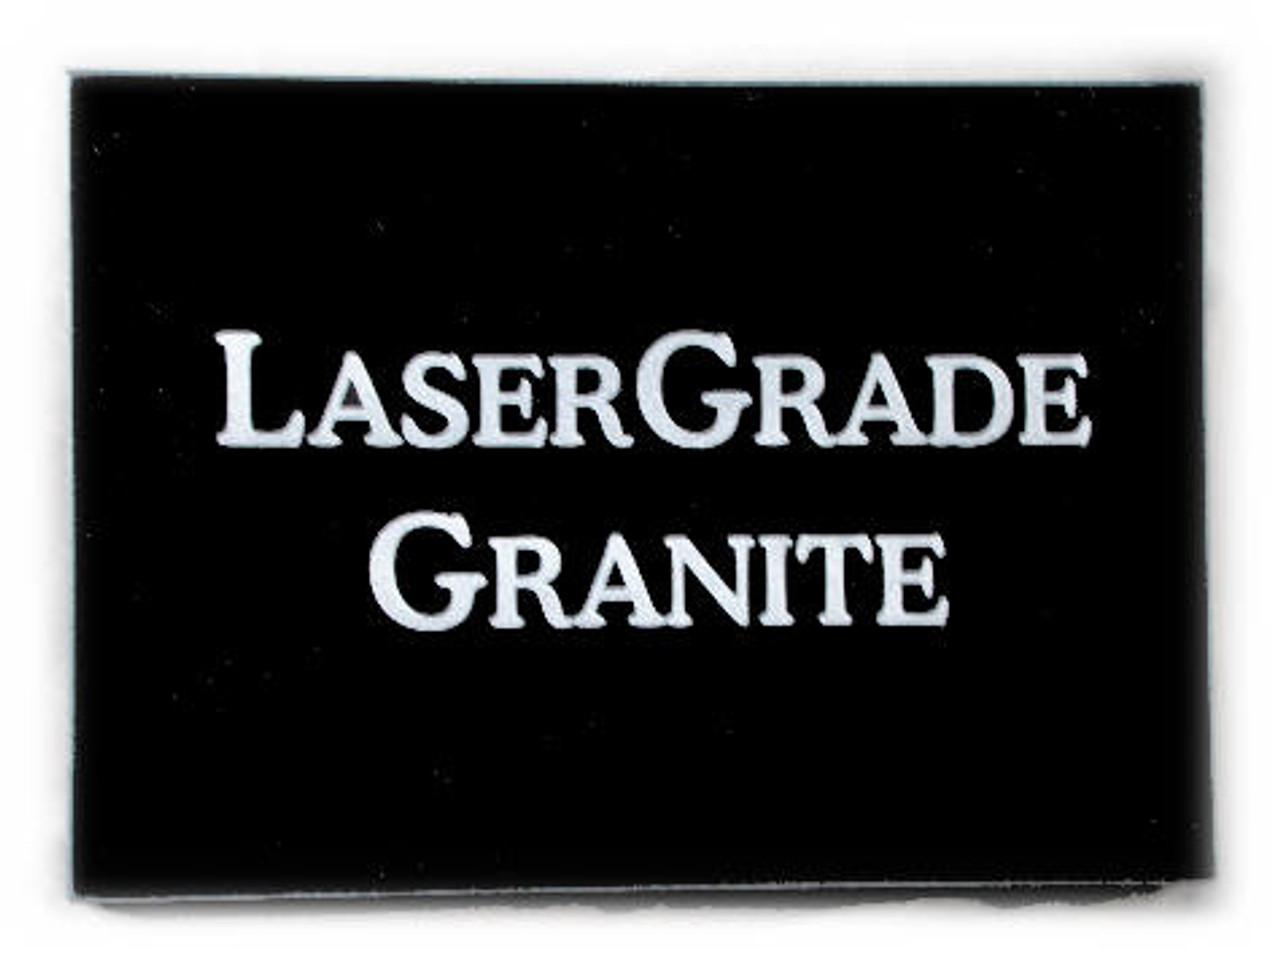 "G-MB-8.5 x 11 EP/:  LaserGrade, MB Black Granite, 8.5"" x 11"" x 7-8mm"" , Edges Polished, (5 face polished) - Case of 10"